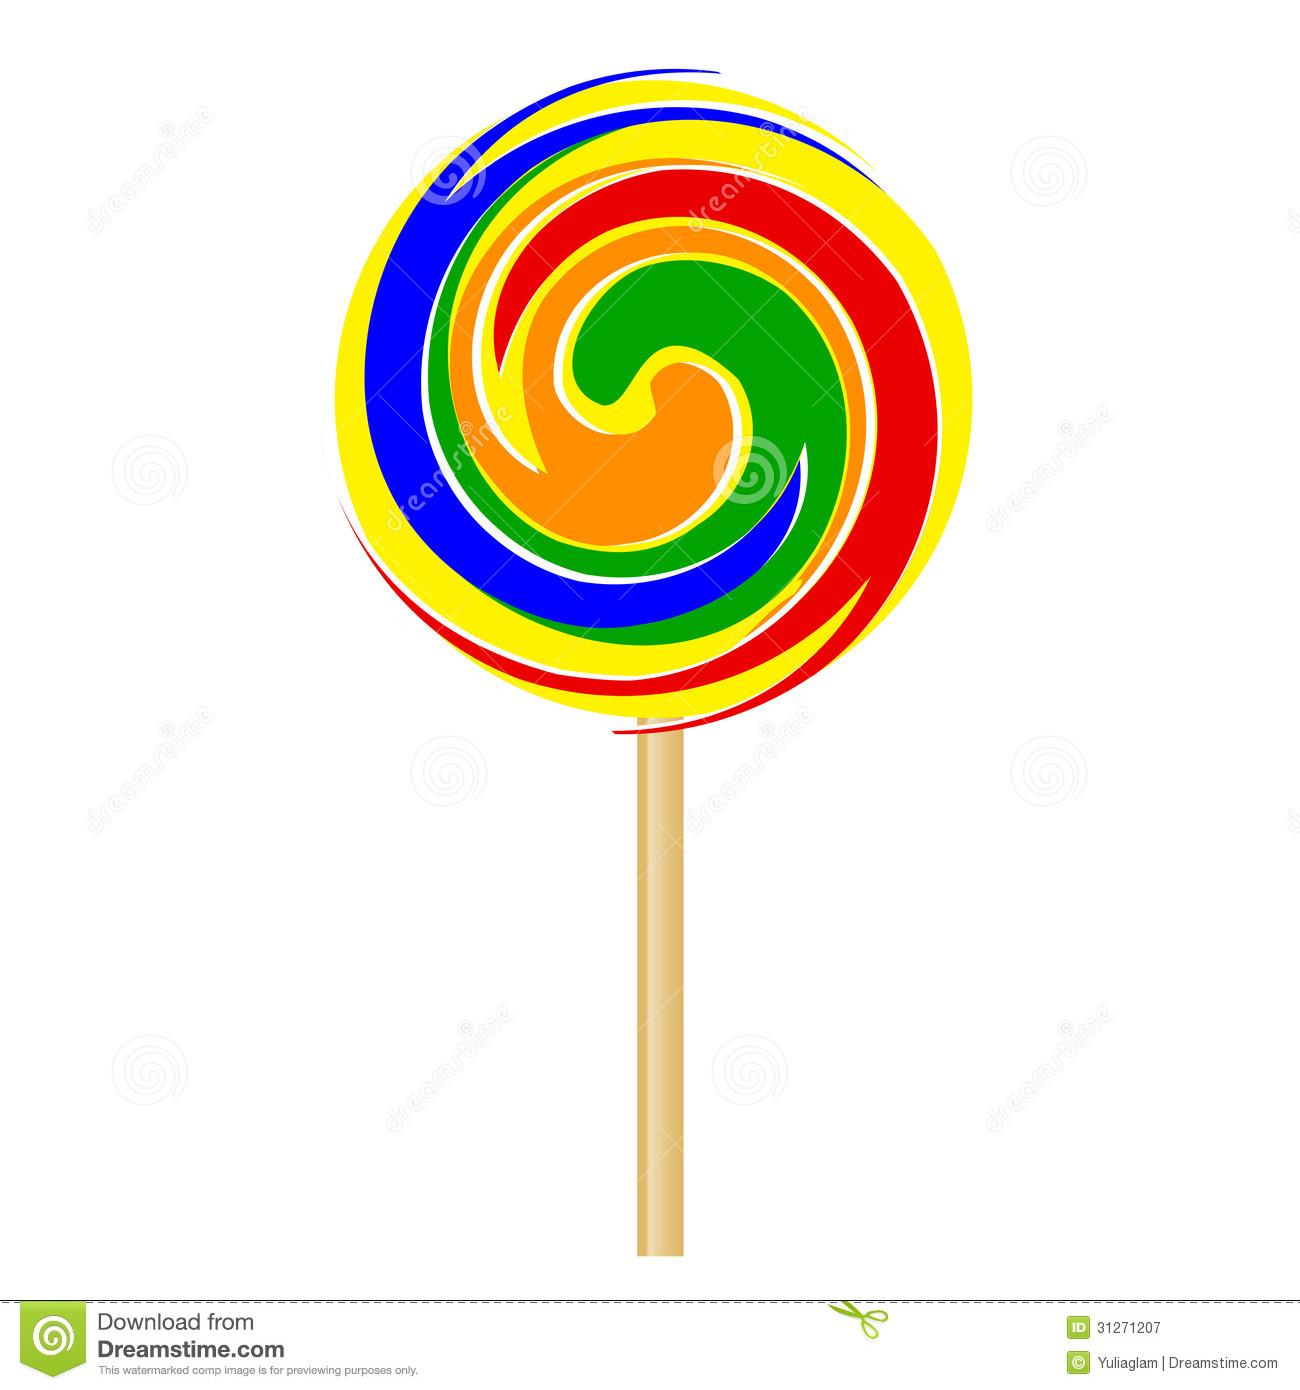 Lollipop image free.